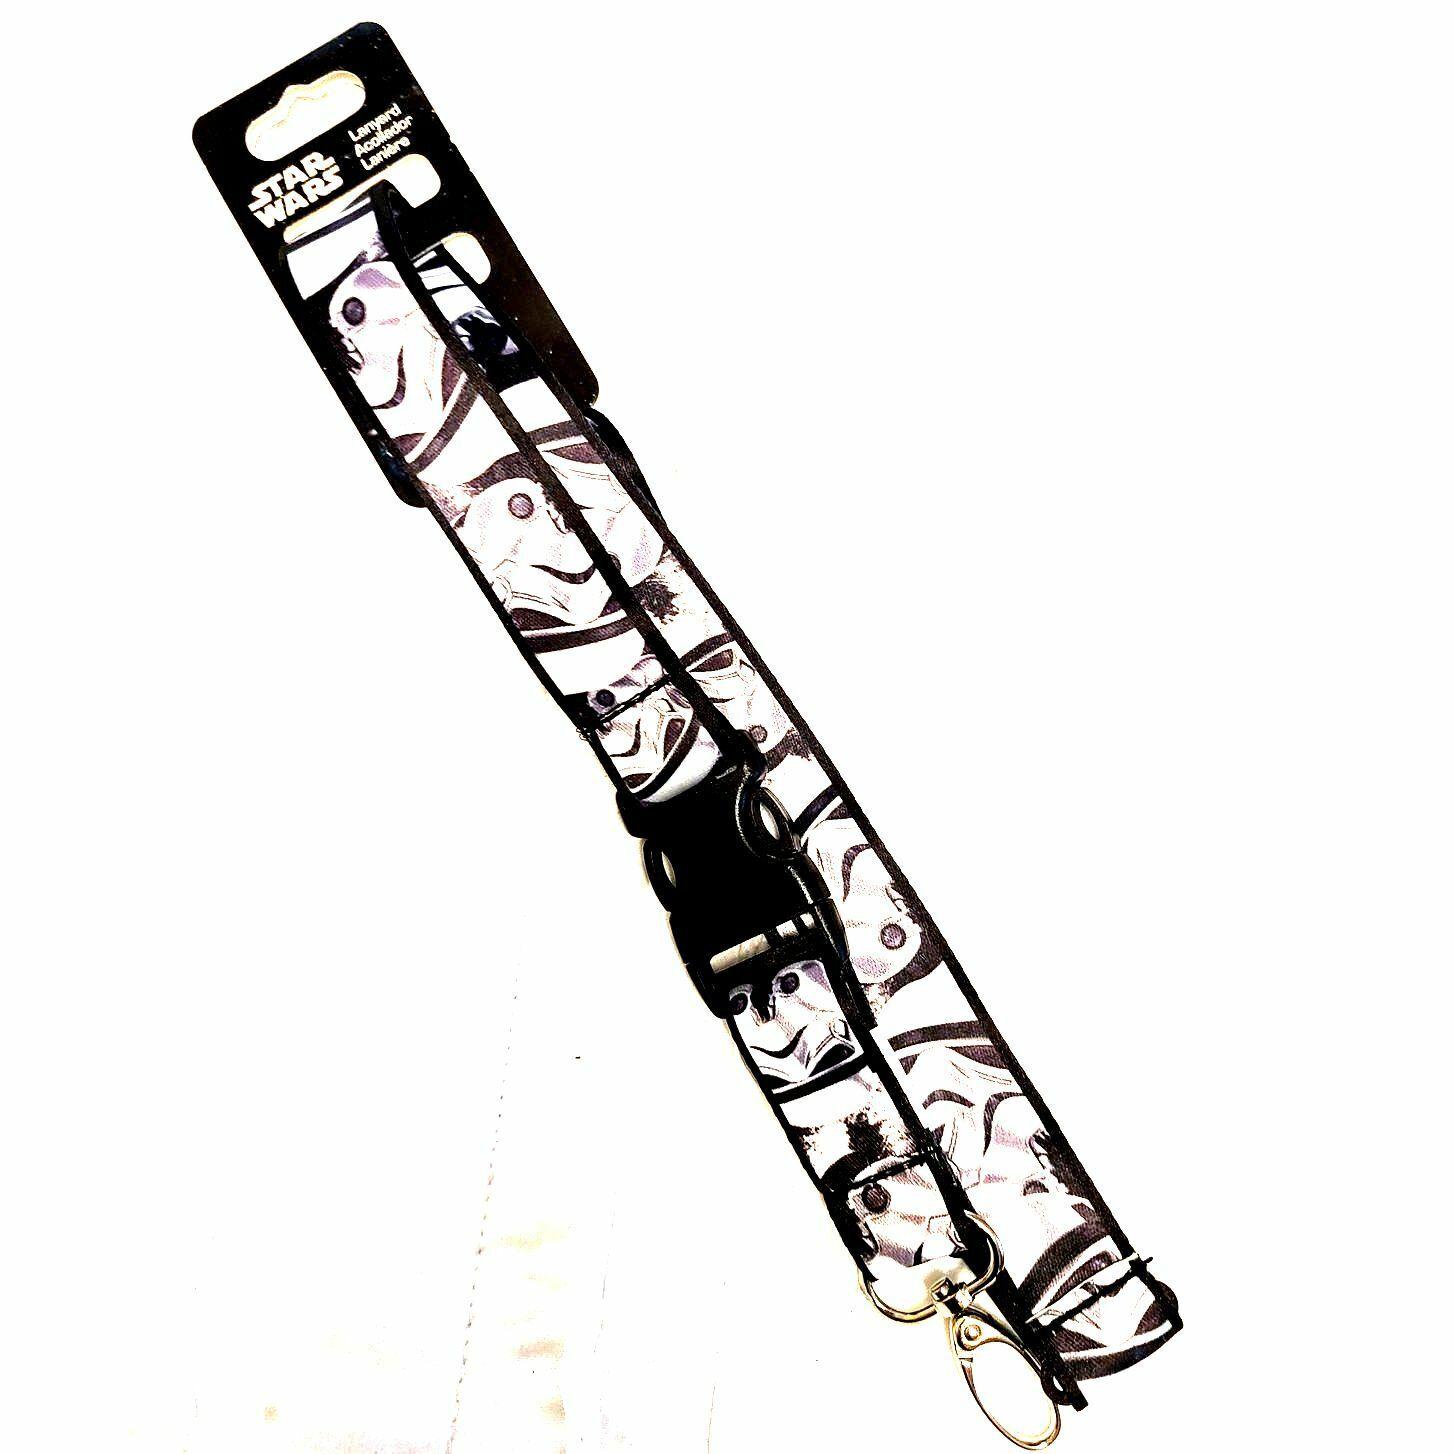 NWT Star Wars Lanyard Acollador black white key chain STORMTROOPER 231.2